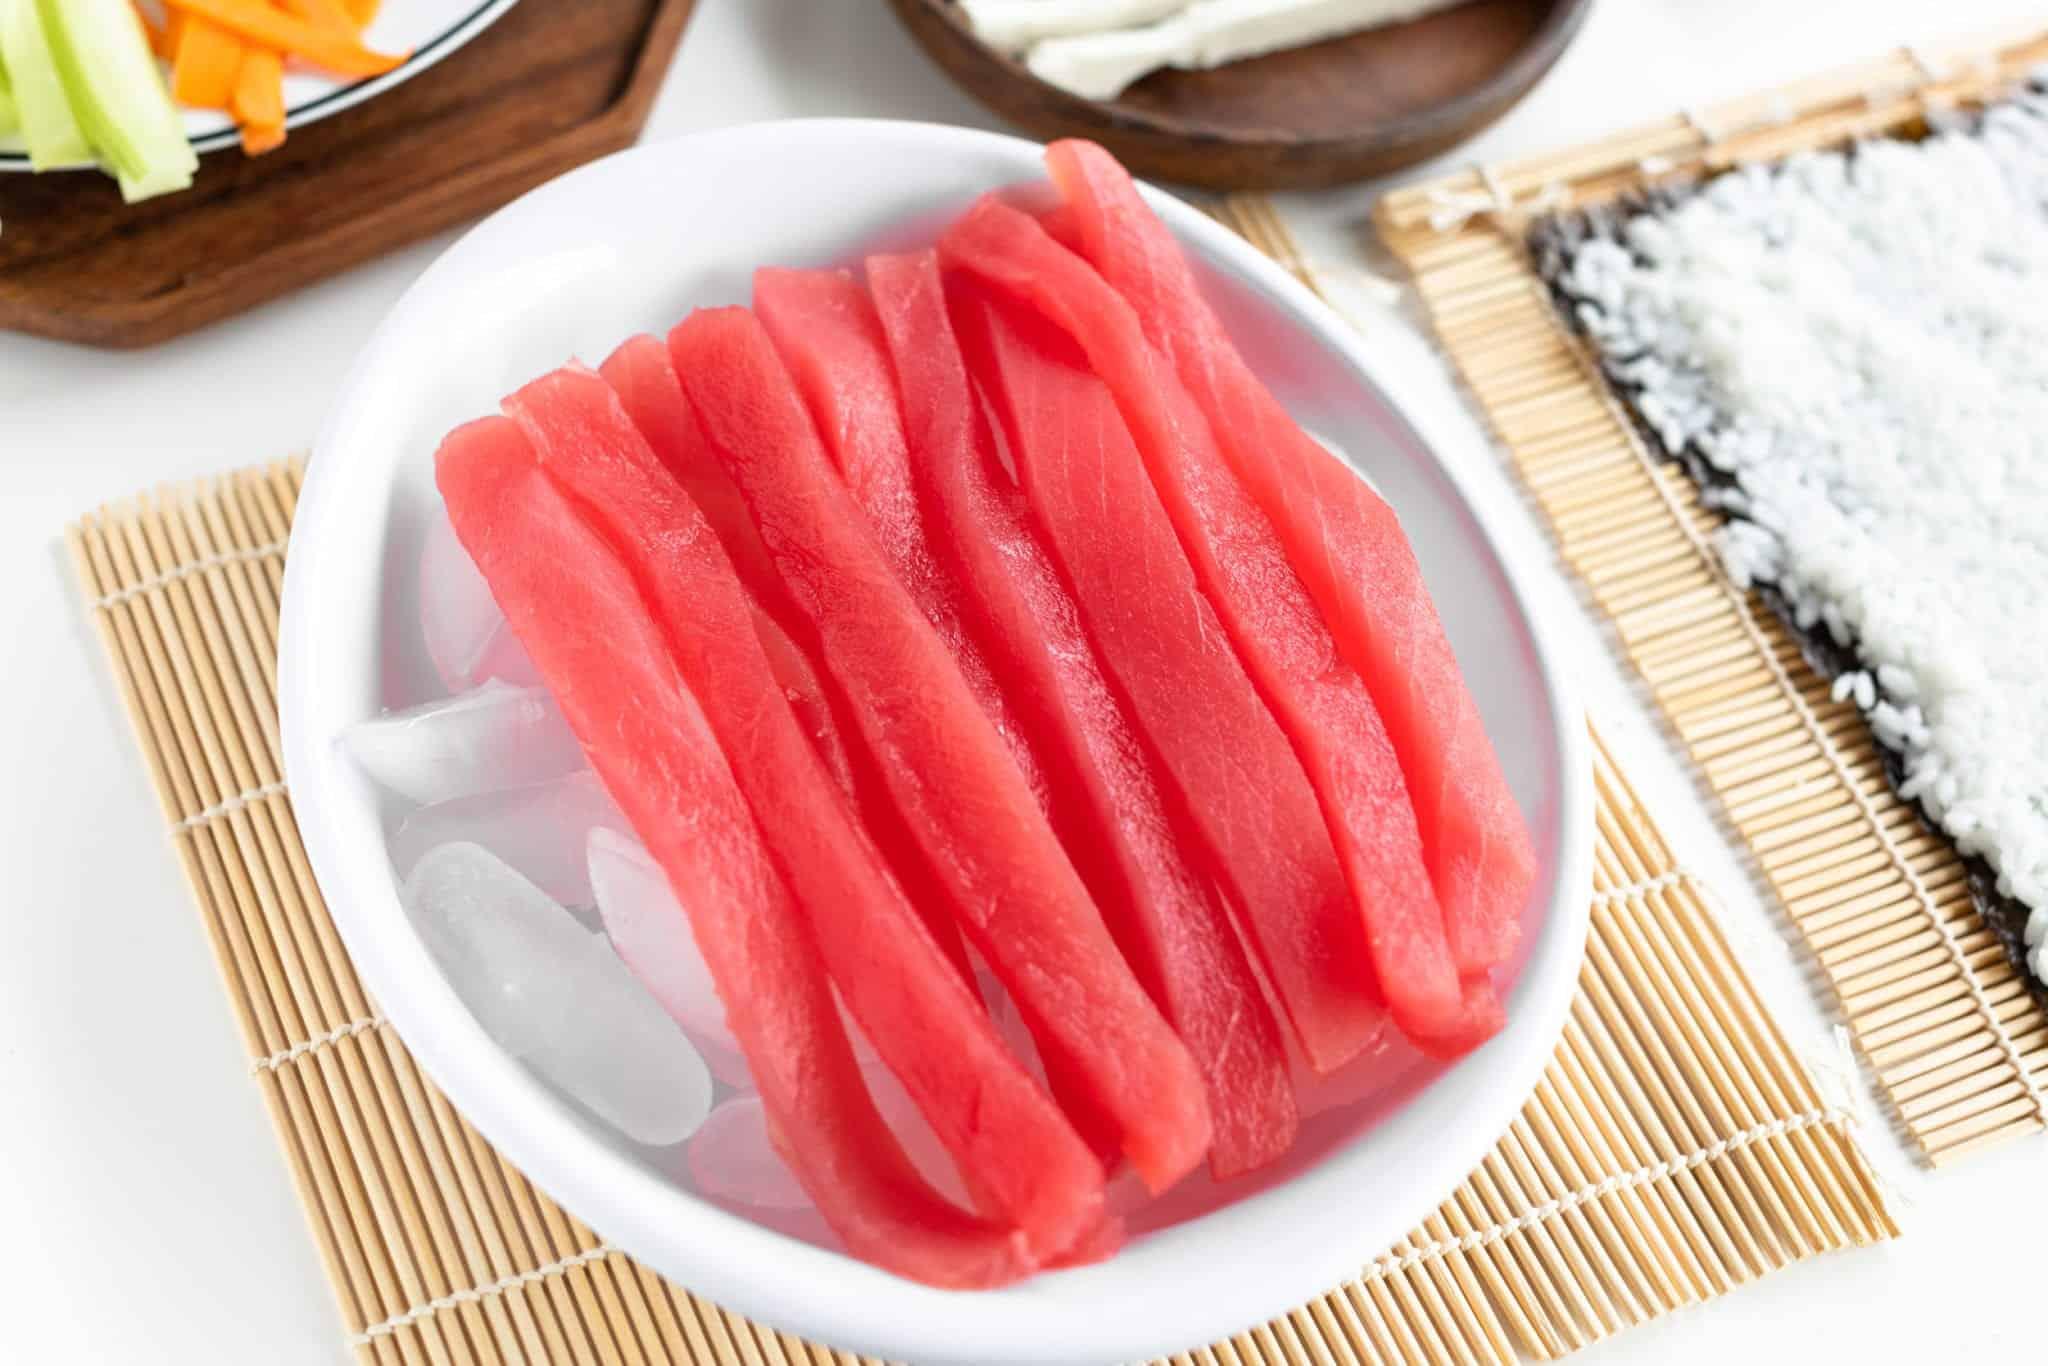 Upclose image of ahi tuna sliced thin over ice #sushi #spicytunamaki #sushirecipe #spicytuna #sushirollrecipes #spicytunamaki #crunchyspicytunaroll #bingeworthybites